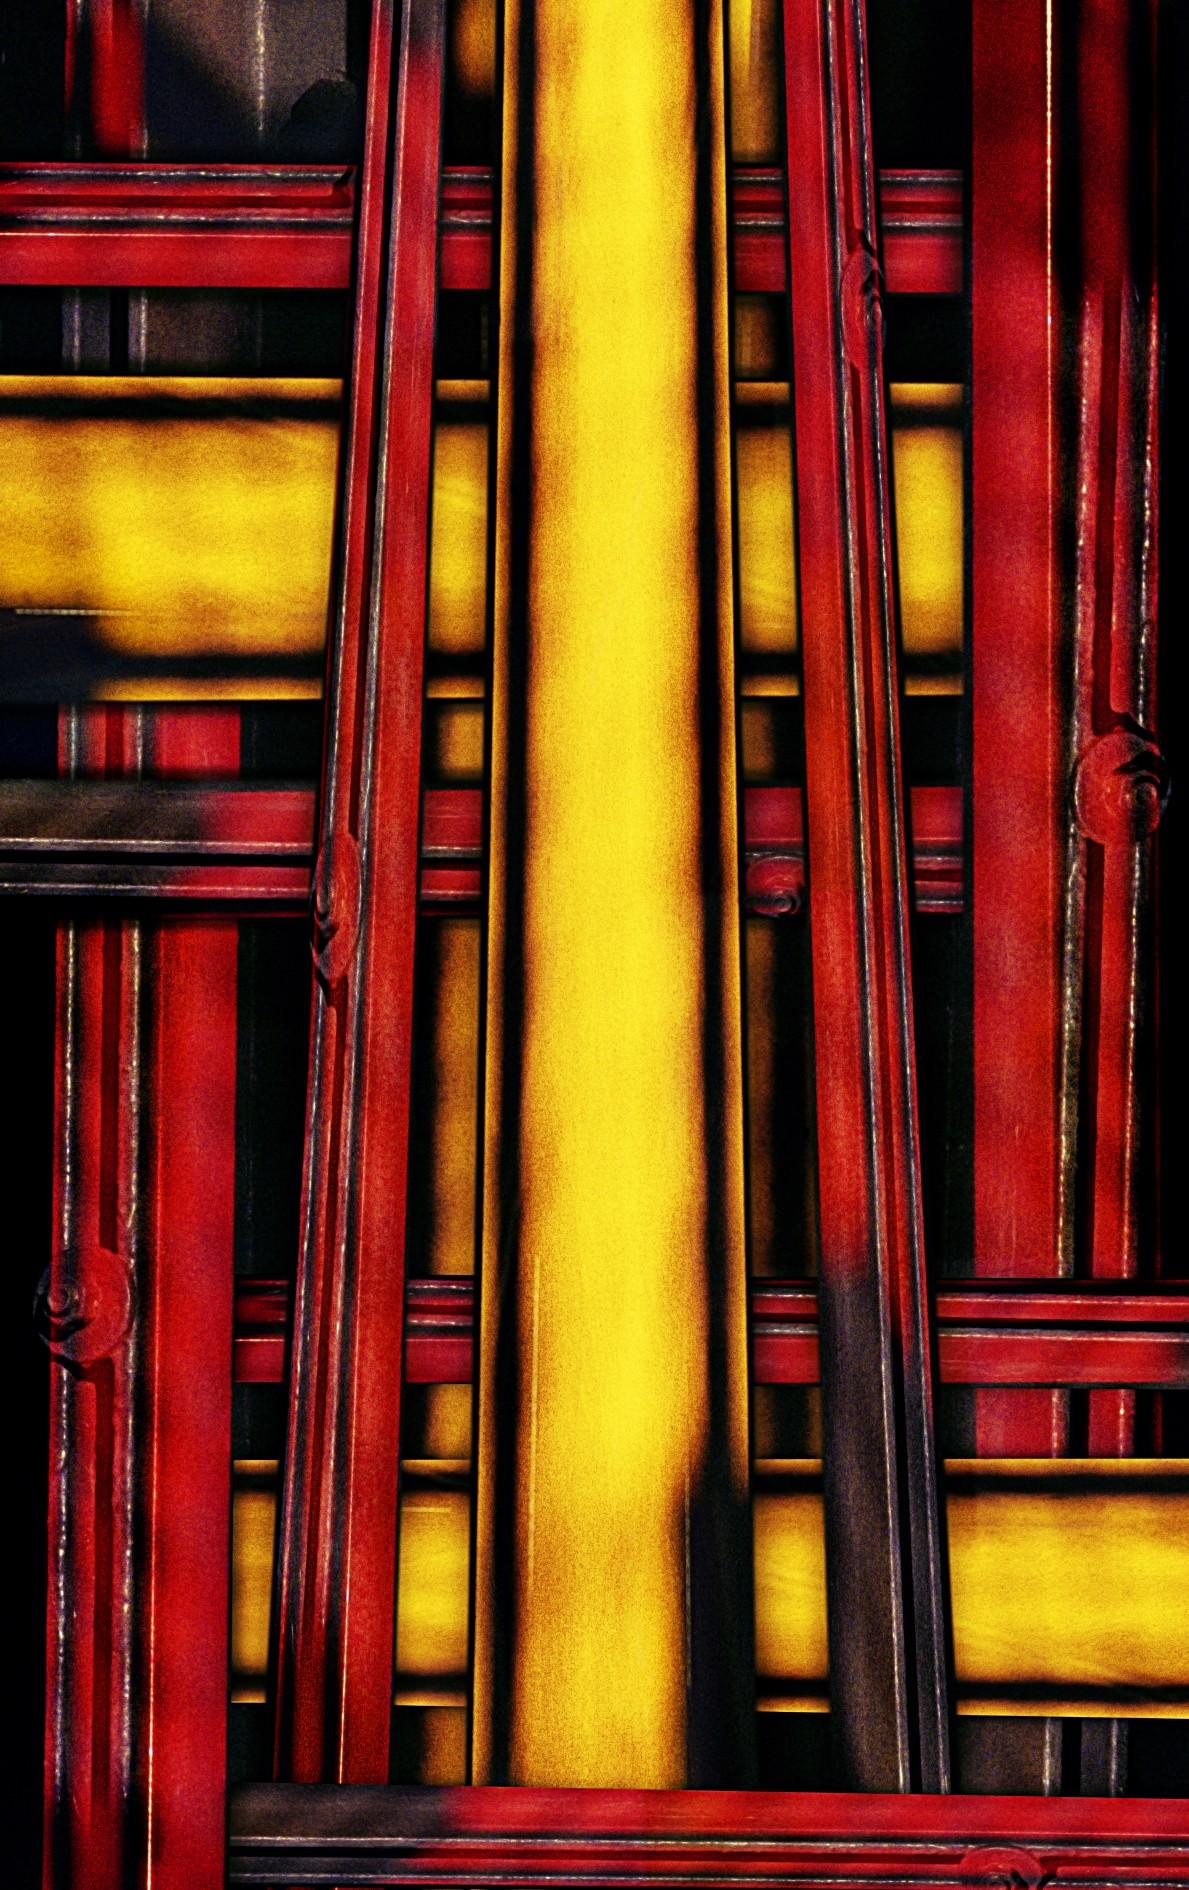 Olivier Dassault - Circulation d'art